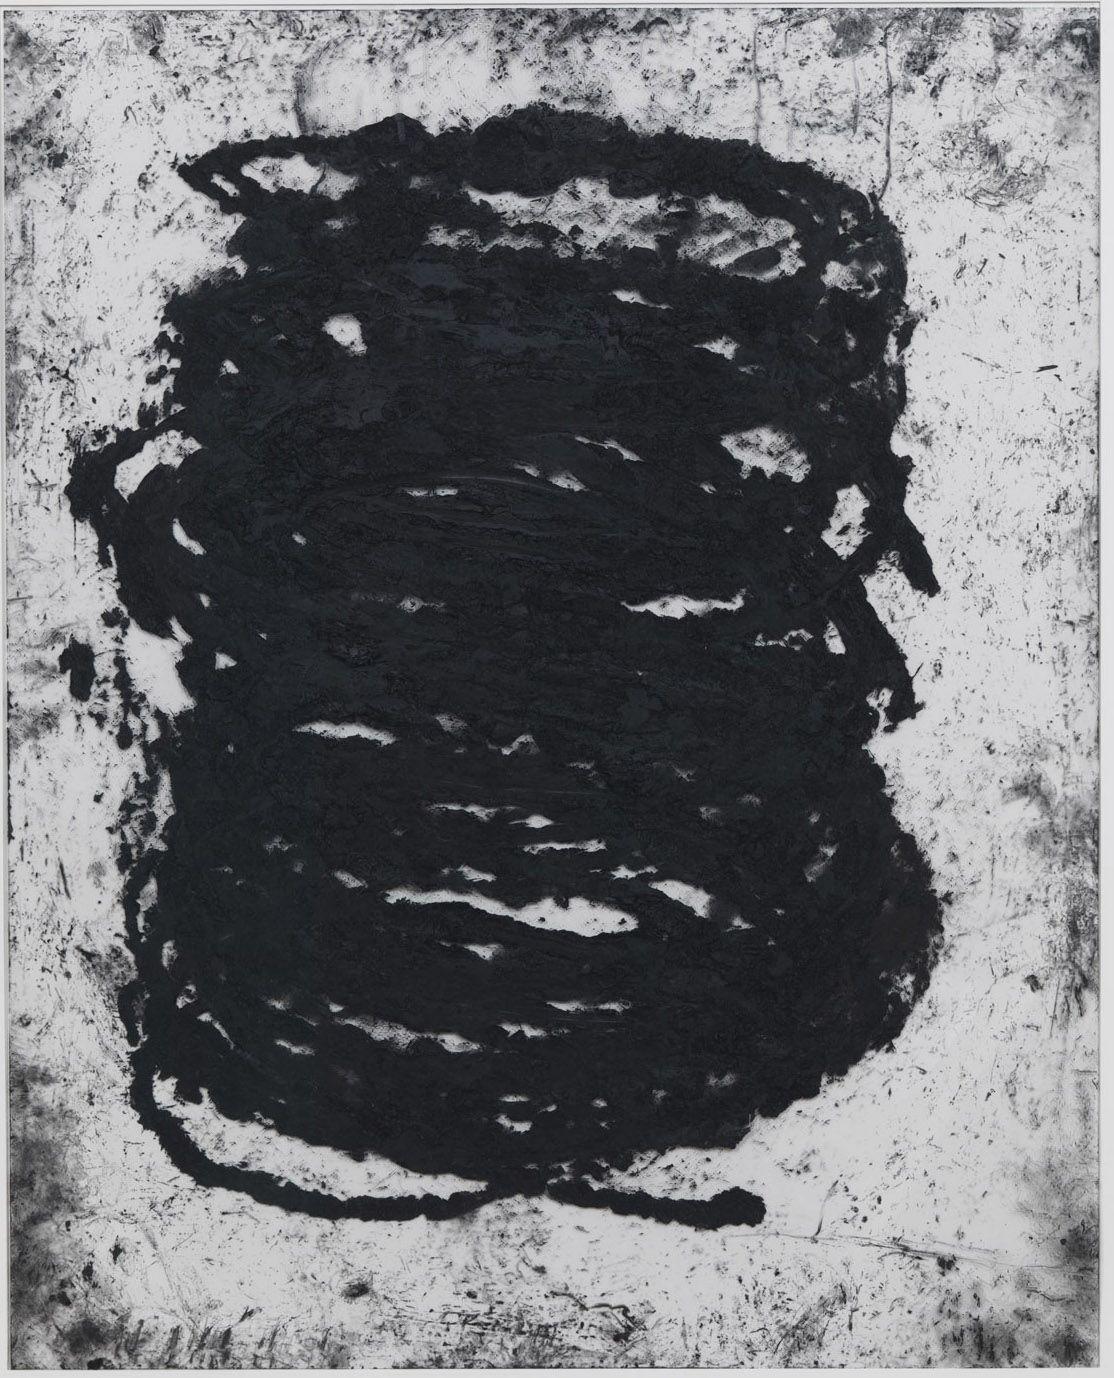 Richard Serra,Transparency #7, 2012.